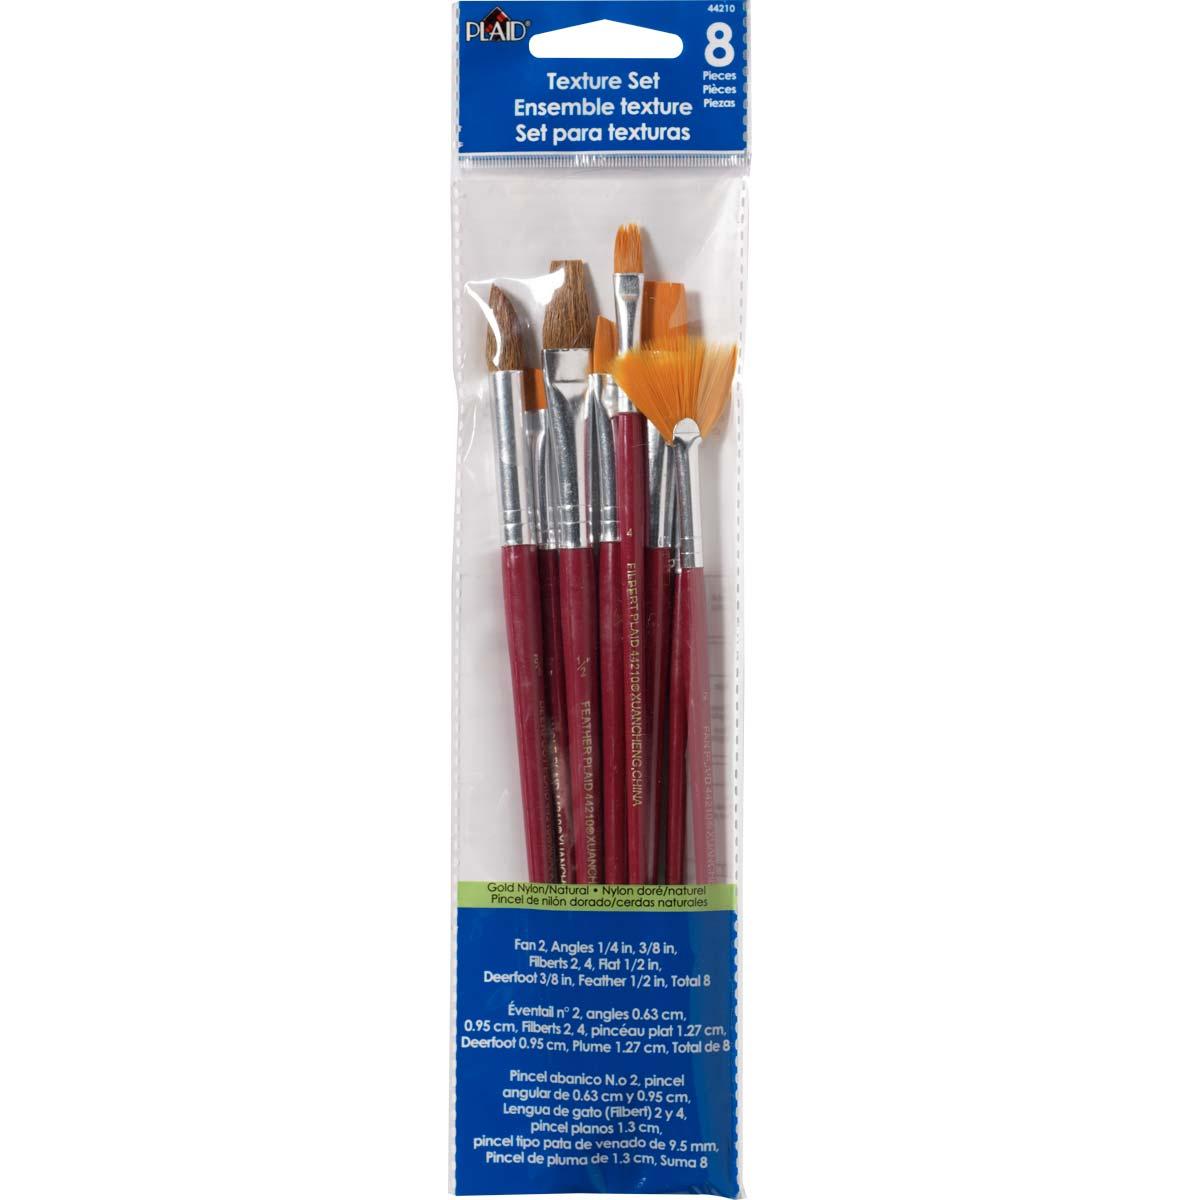 Plaid ® Brush Sets - Texture - 44210